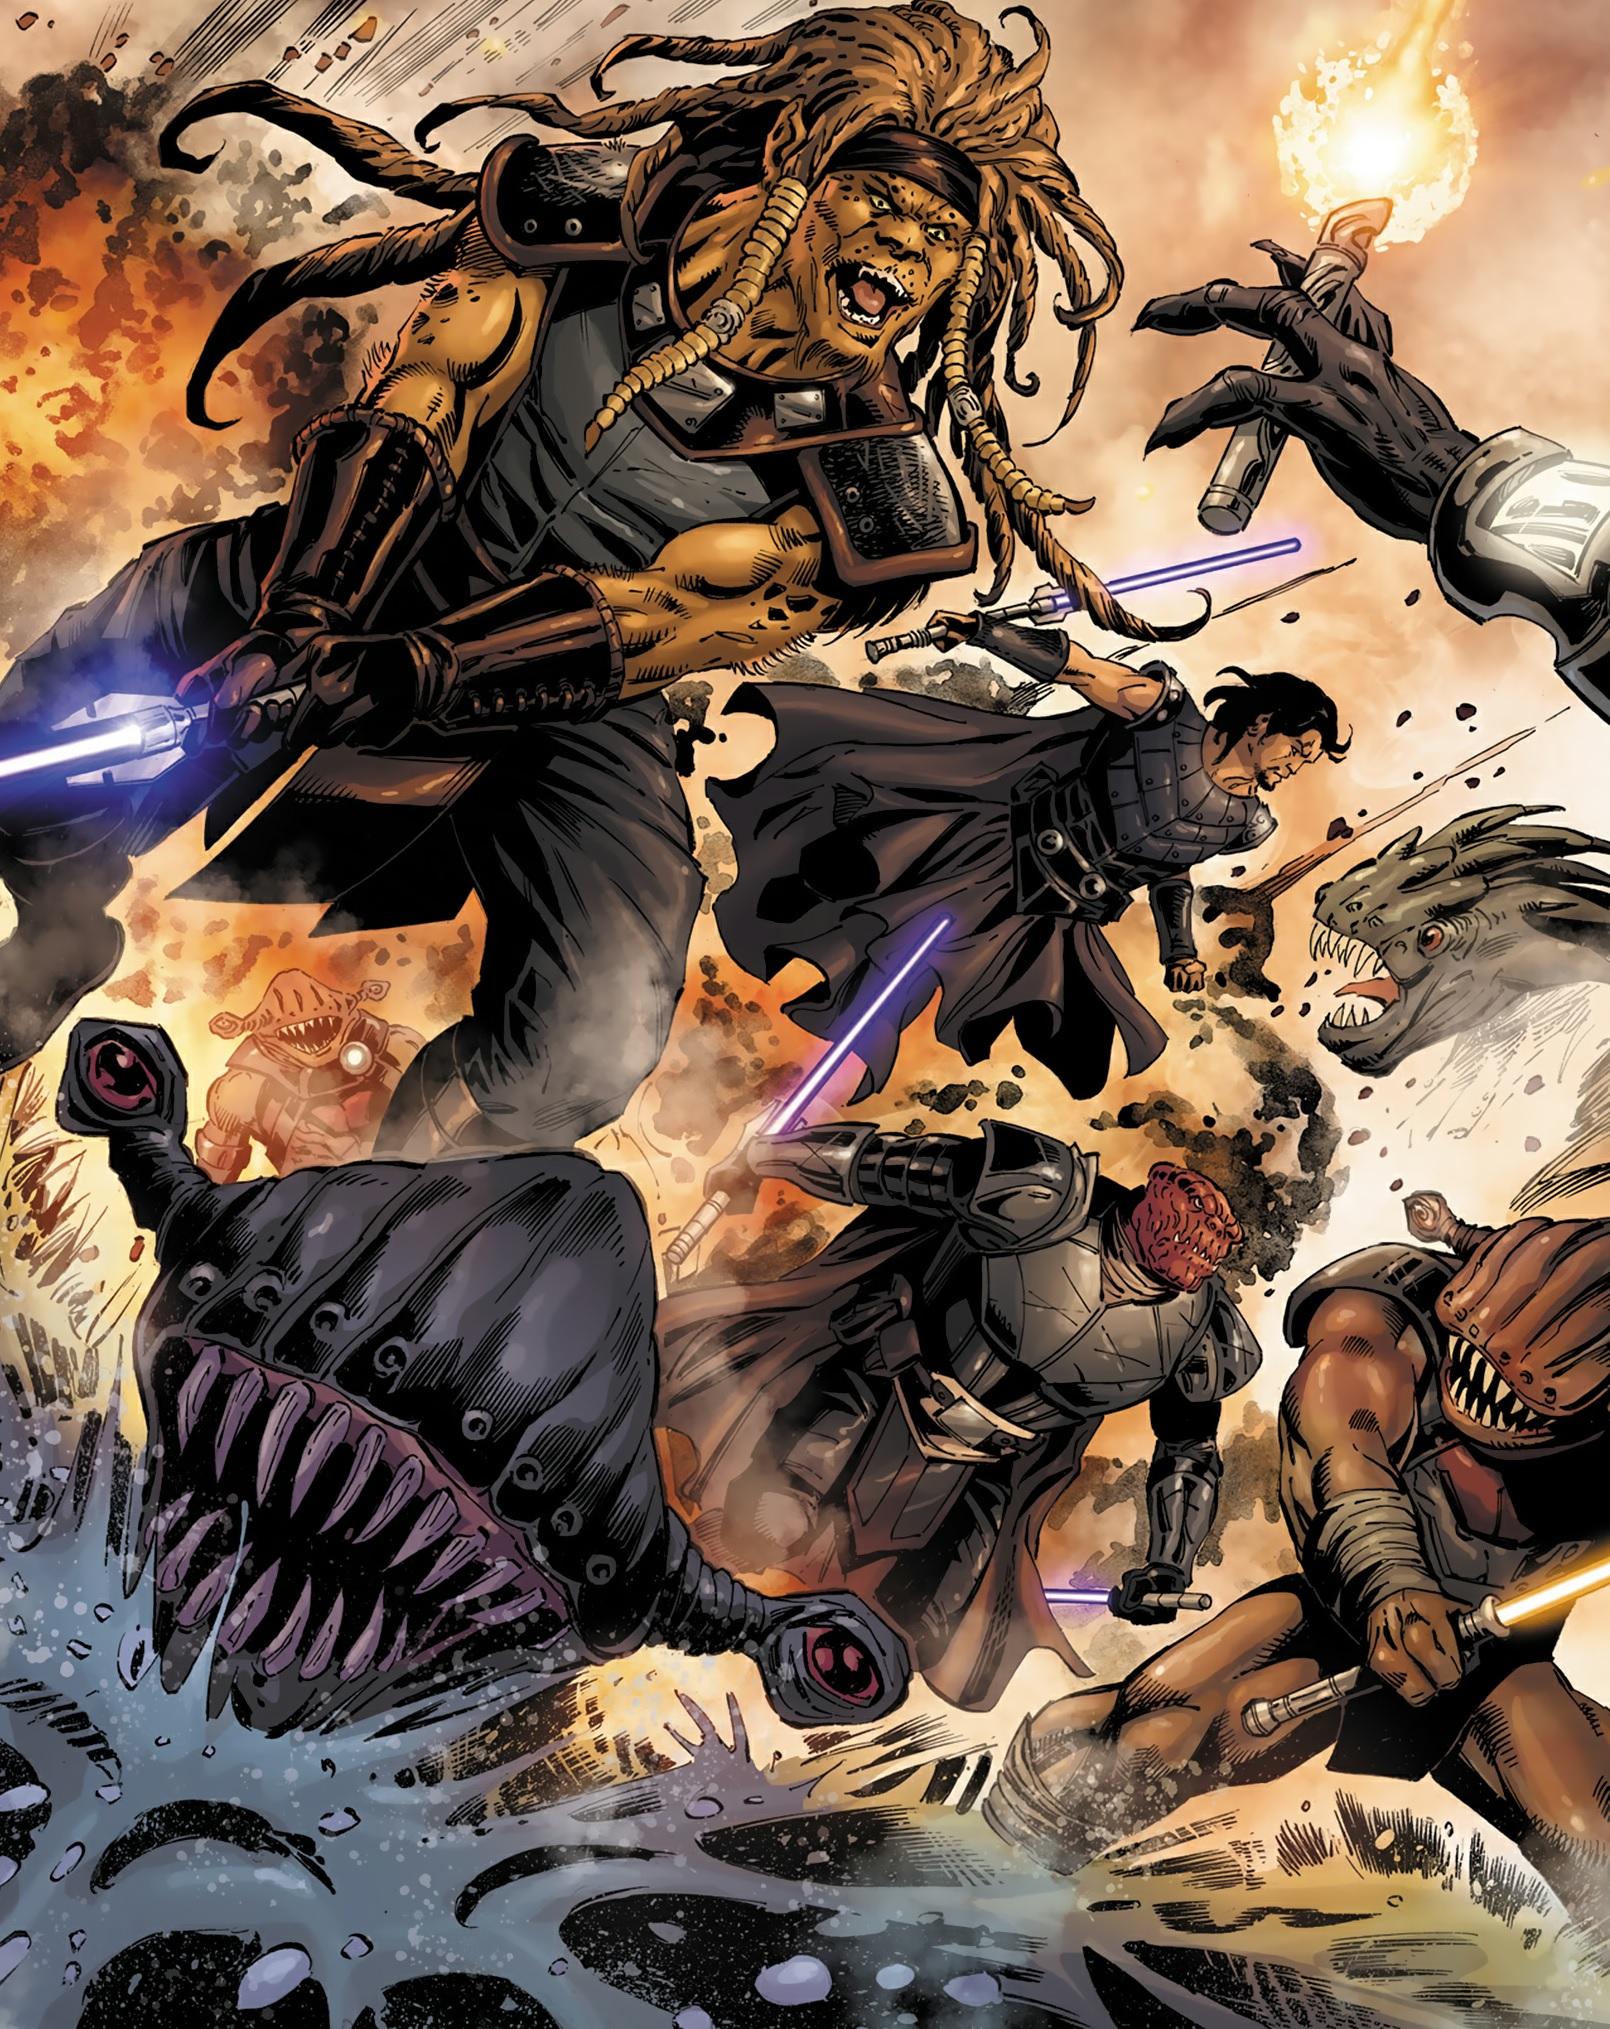 Karness Muur led to Darth Andeddu led to Darth Bane